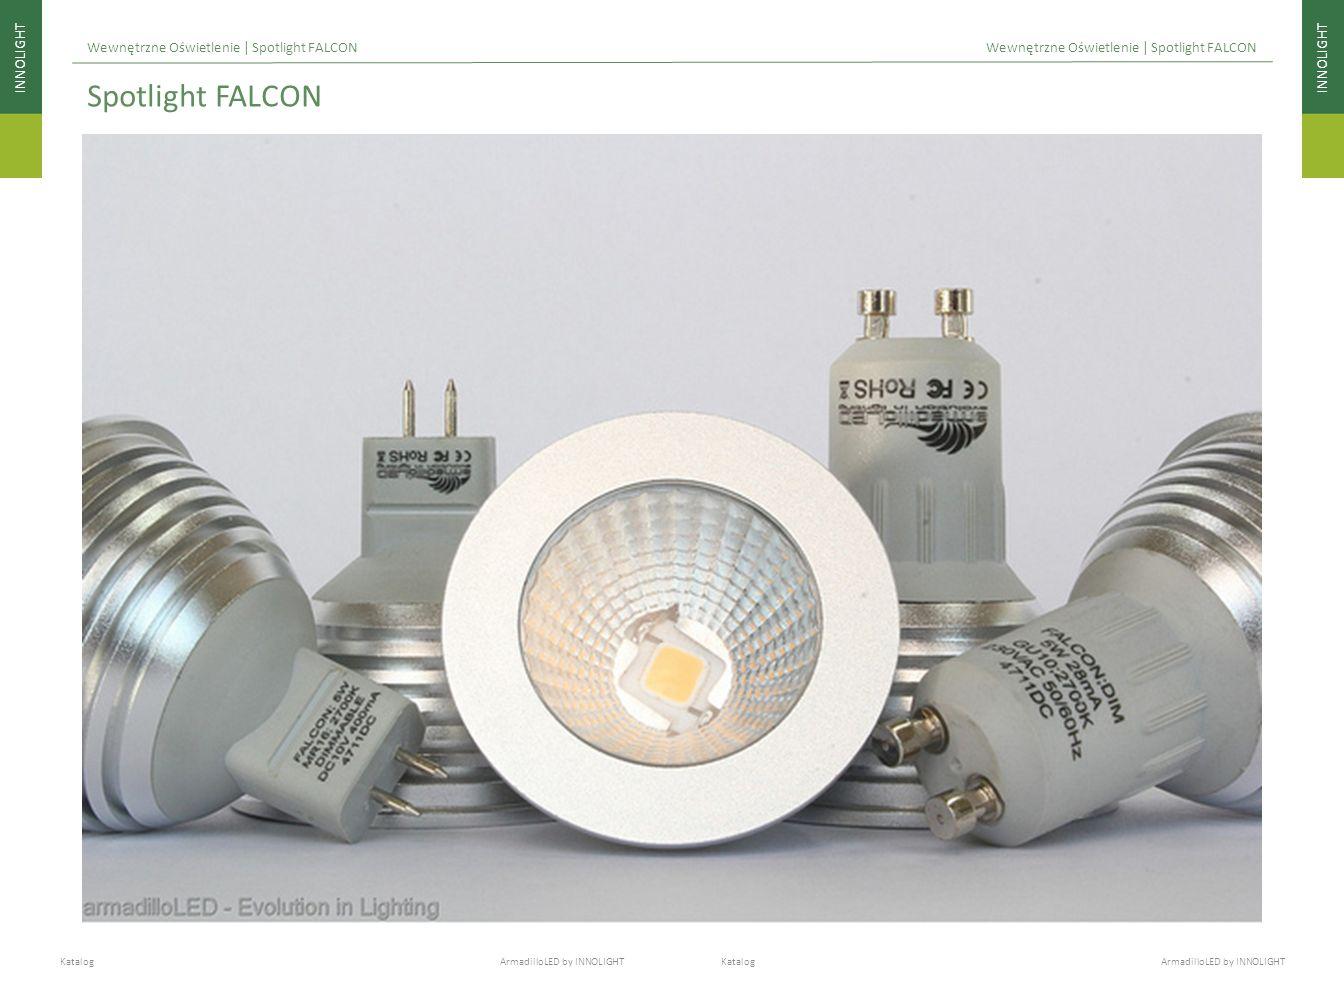 INNOLIGHT Katalog ArmadilloLED by INNOLIGHT Wewnętrzne Oświetlenie | Spotlight FALCON Spotlight FALCON